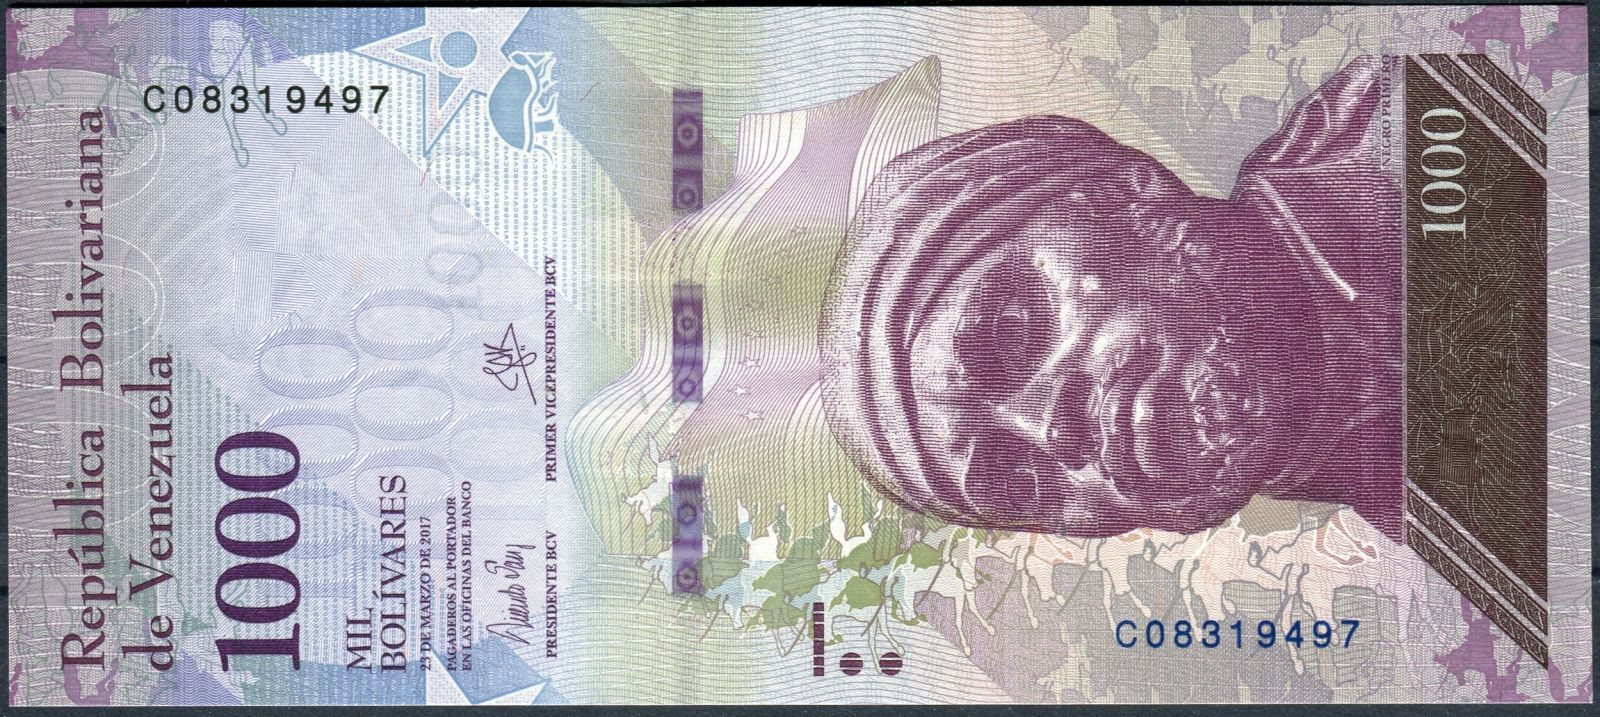 Venezuela (P 95b) - 1000 bolivares (23.3.2017) - UNC